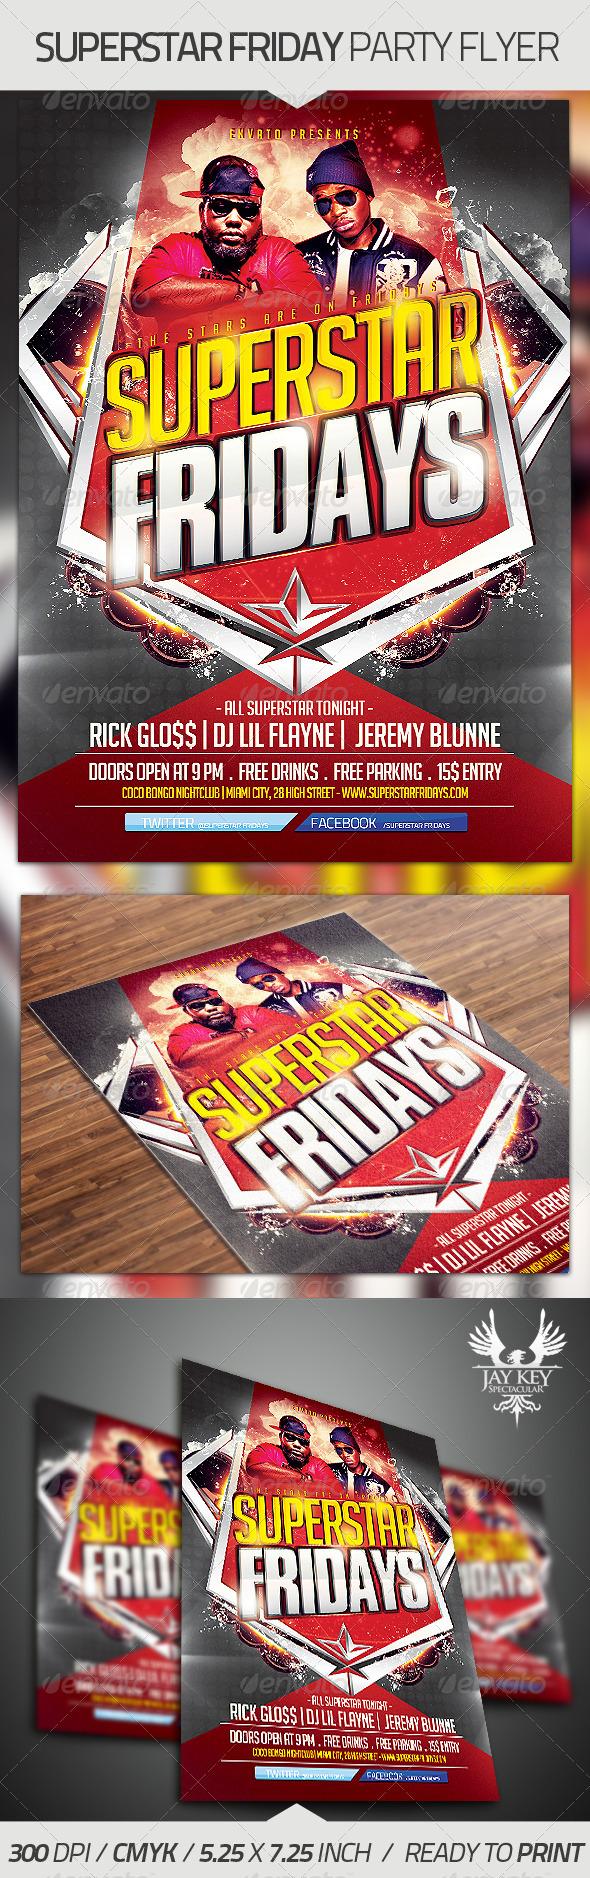 Superstar Fridays Party Flyer